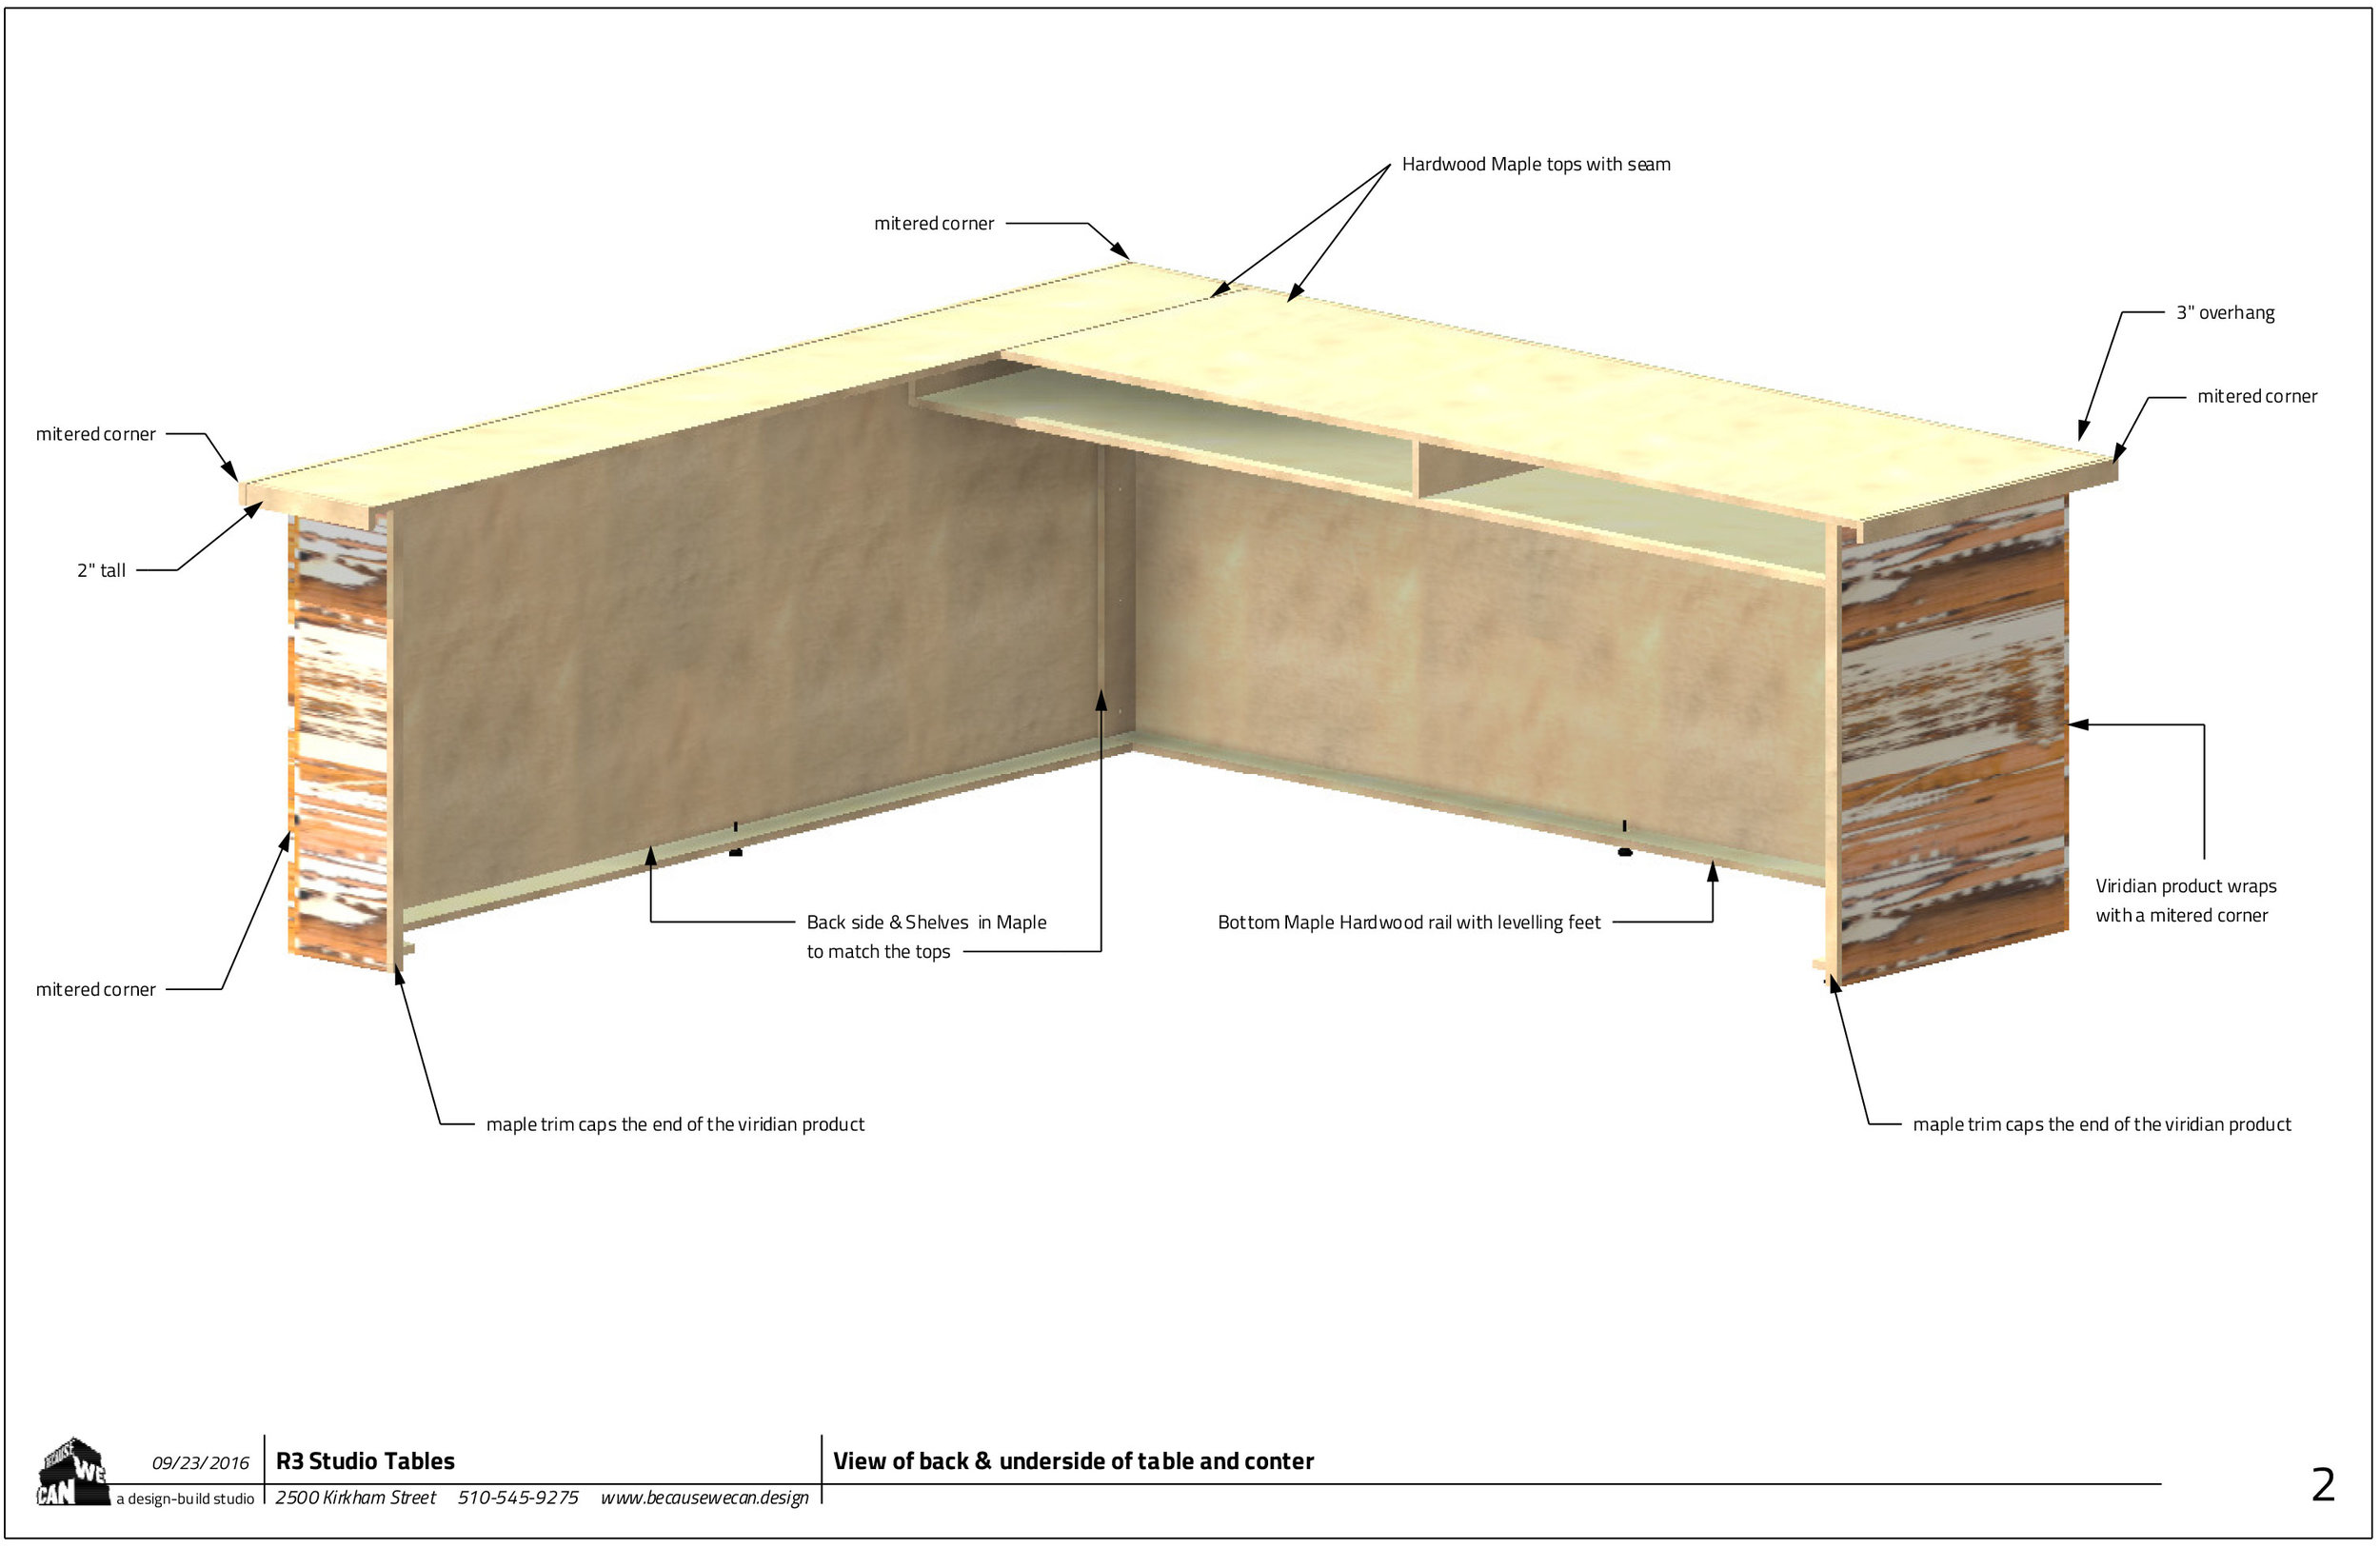 092816_R3StudioTables_Design-2-WEB.jpg